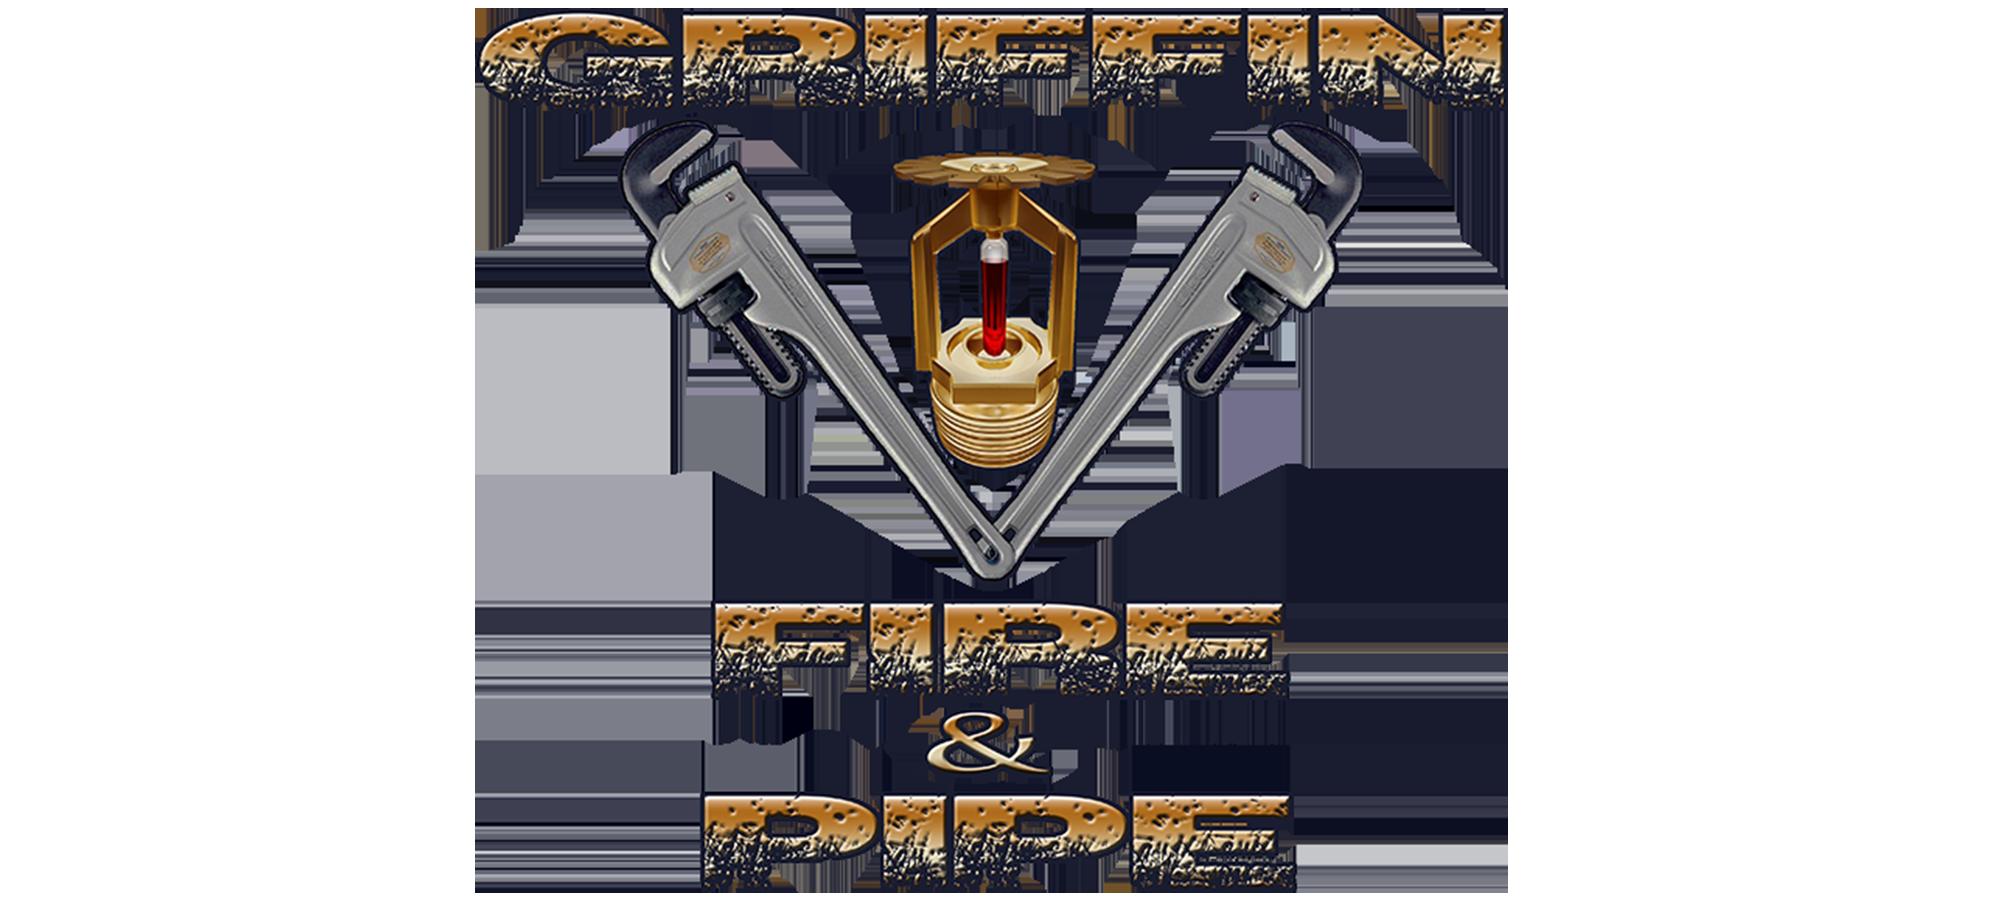 Sprinkler Labor, Service Inspection, Piping & Back Flows